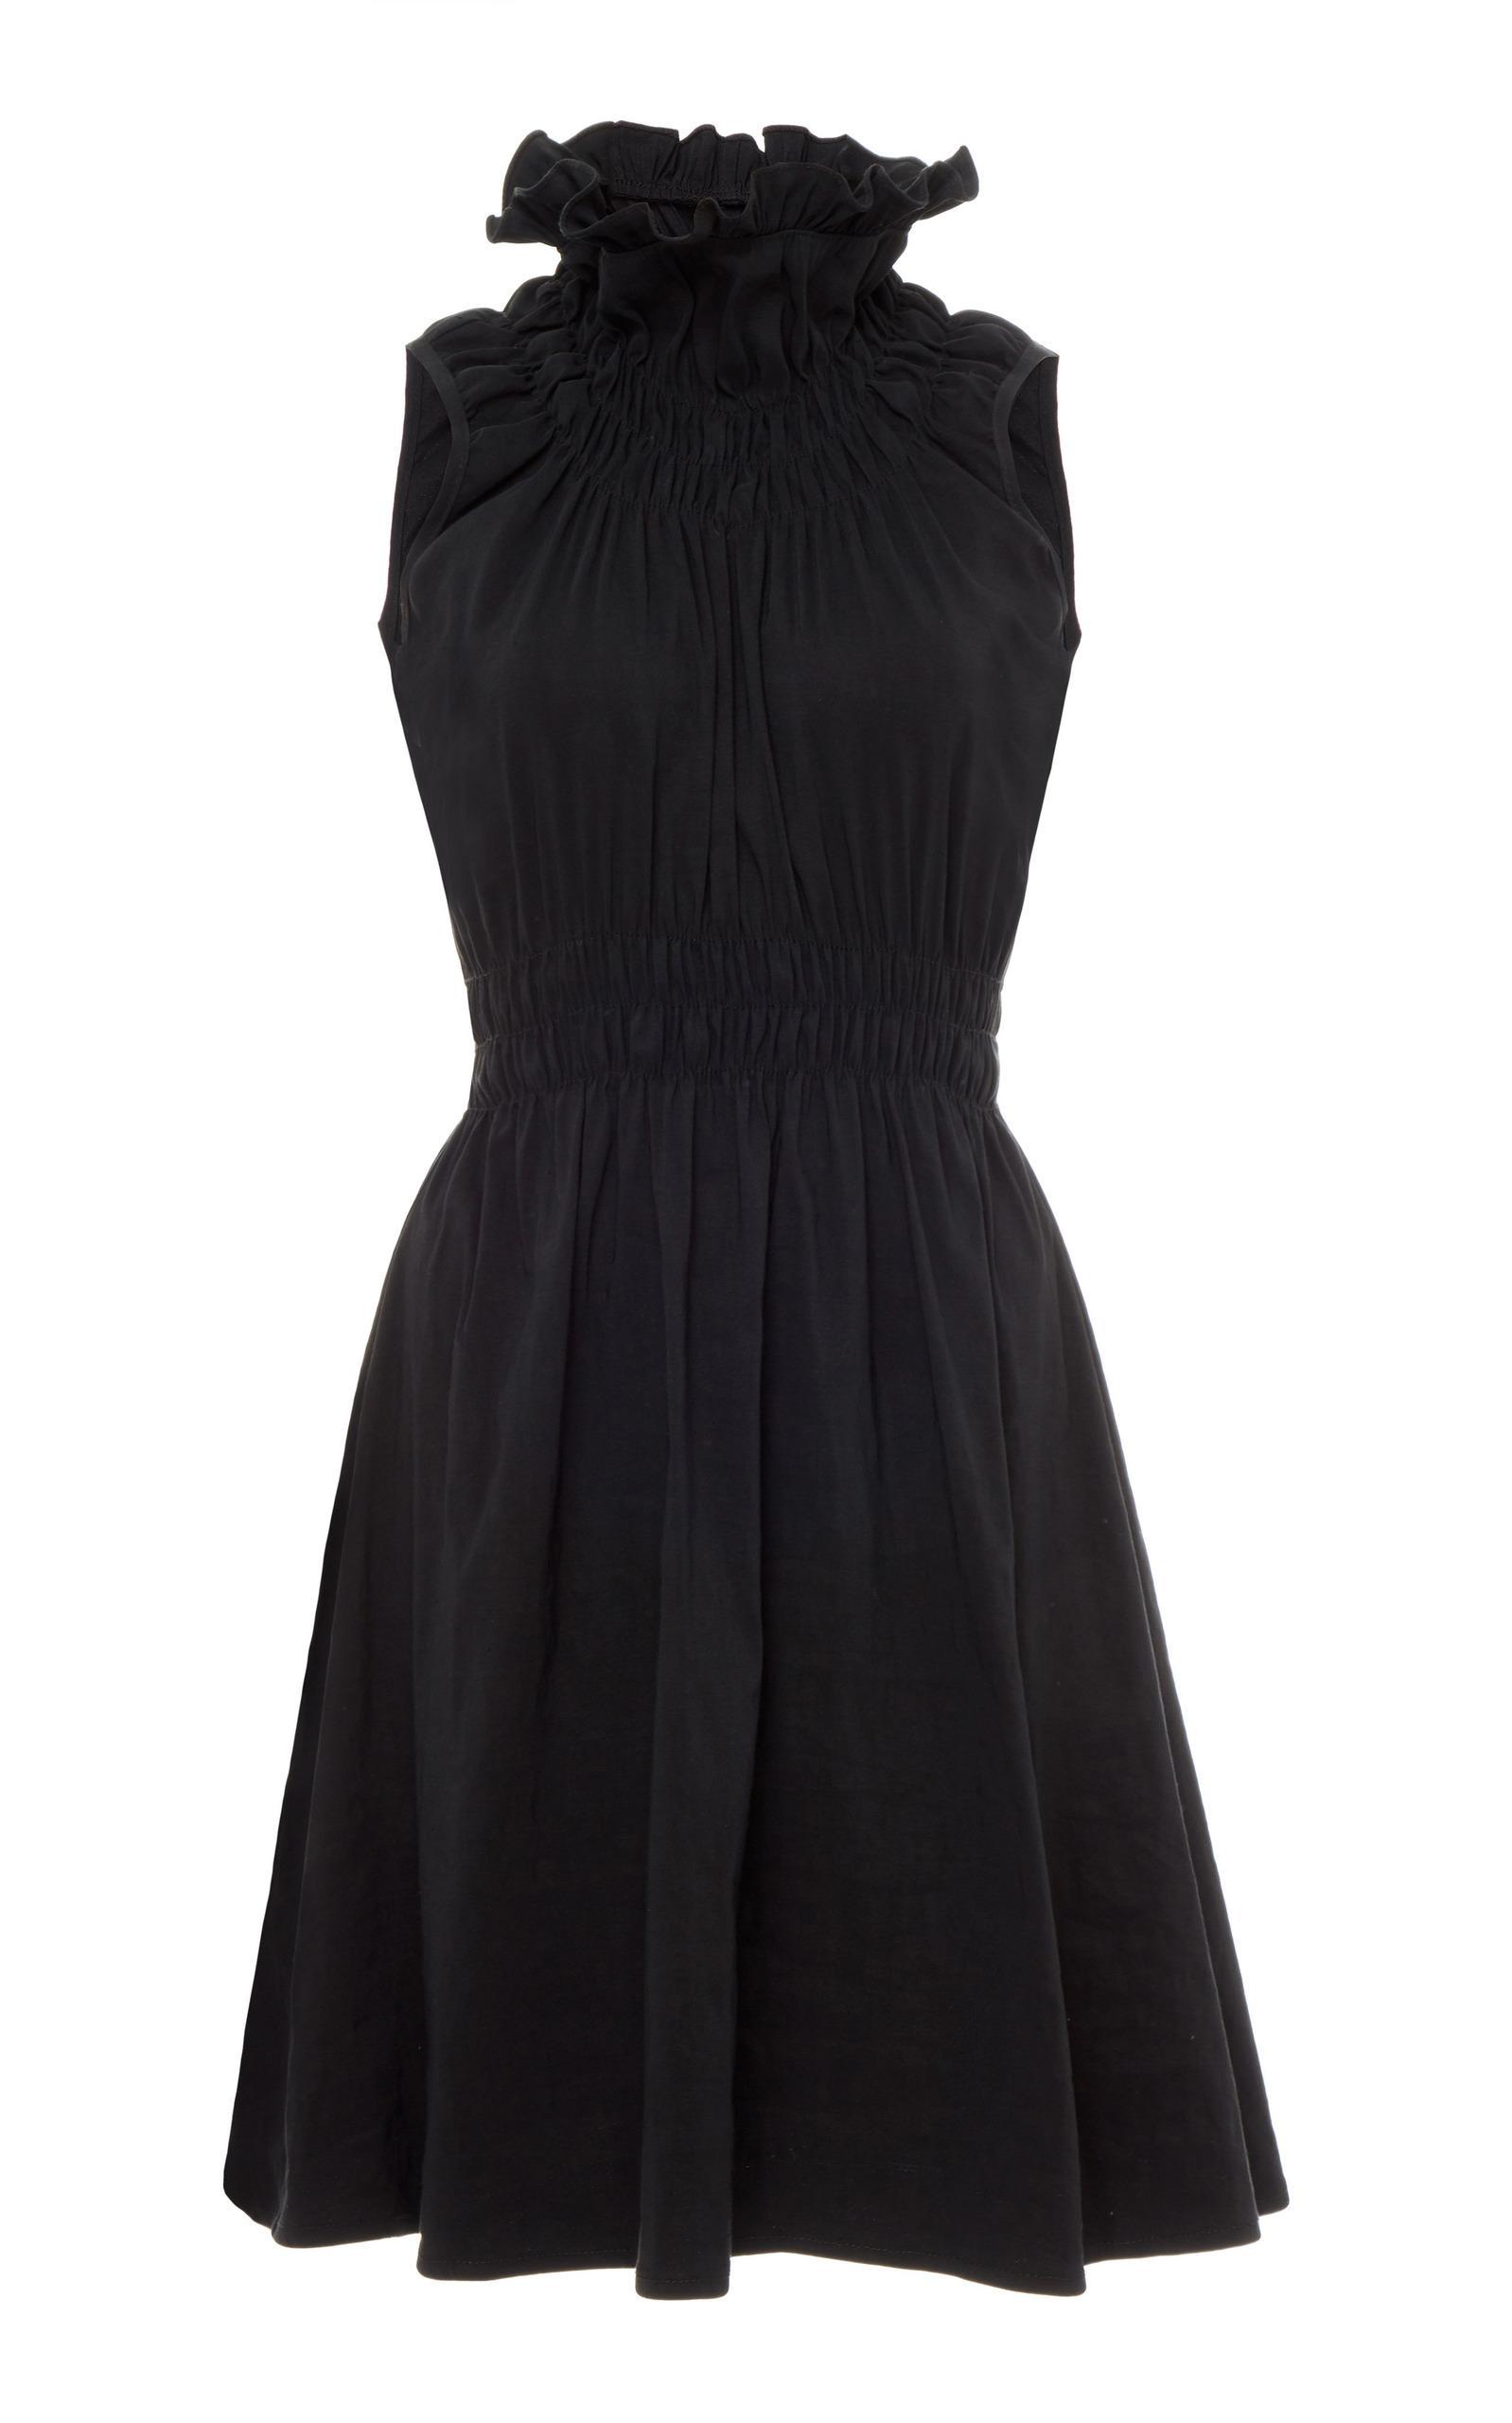 Beaufille Ossa Turtleneck Mini Dress In Black